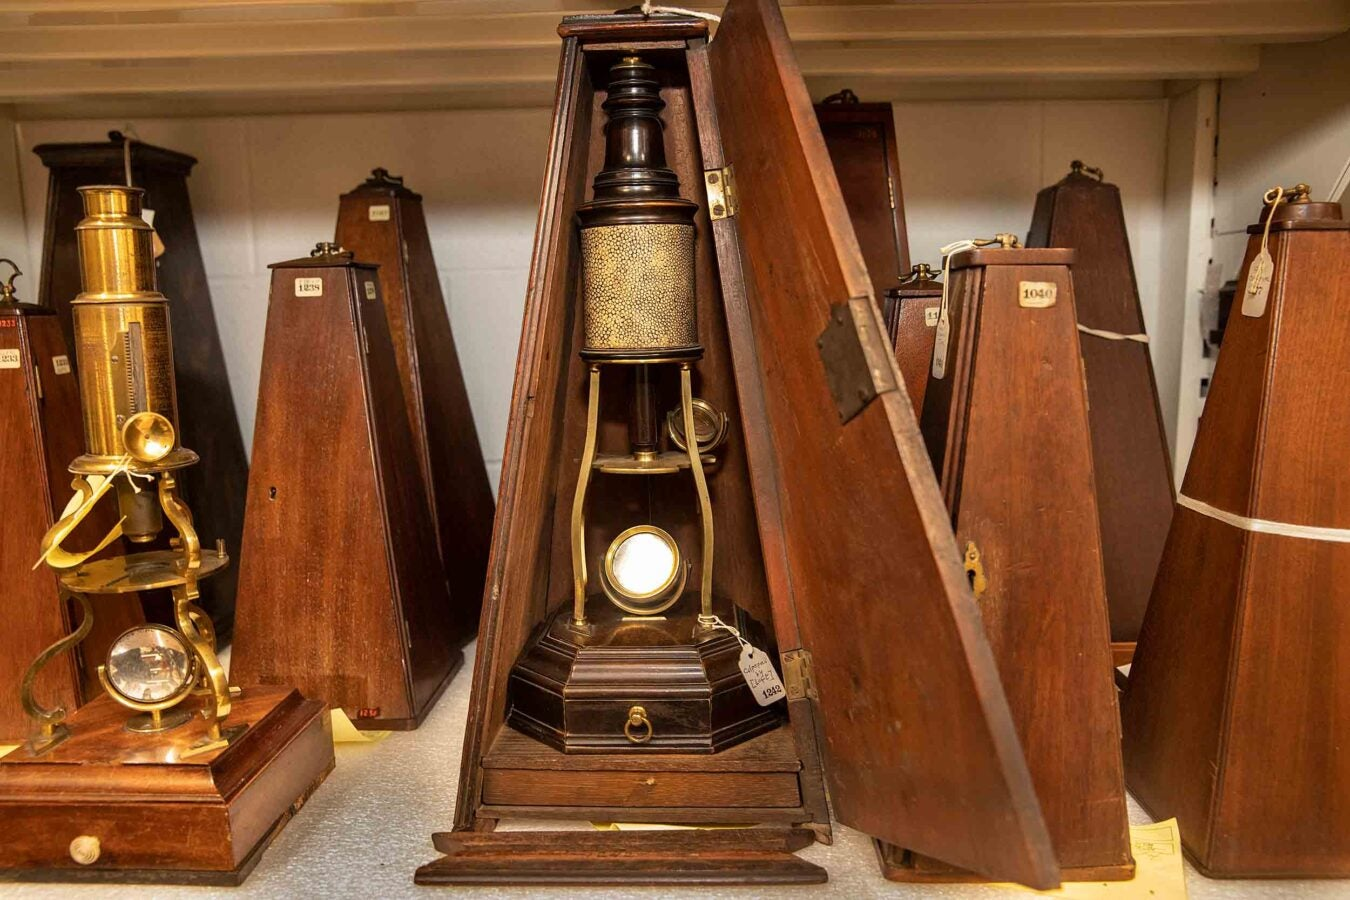 Microscopes made in London circa 1730.